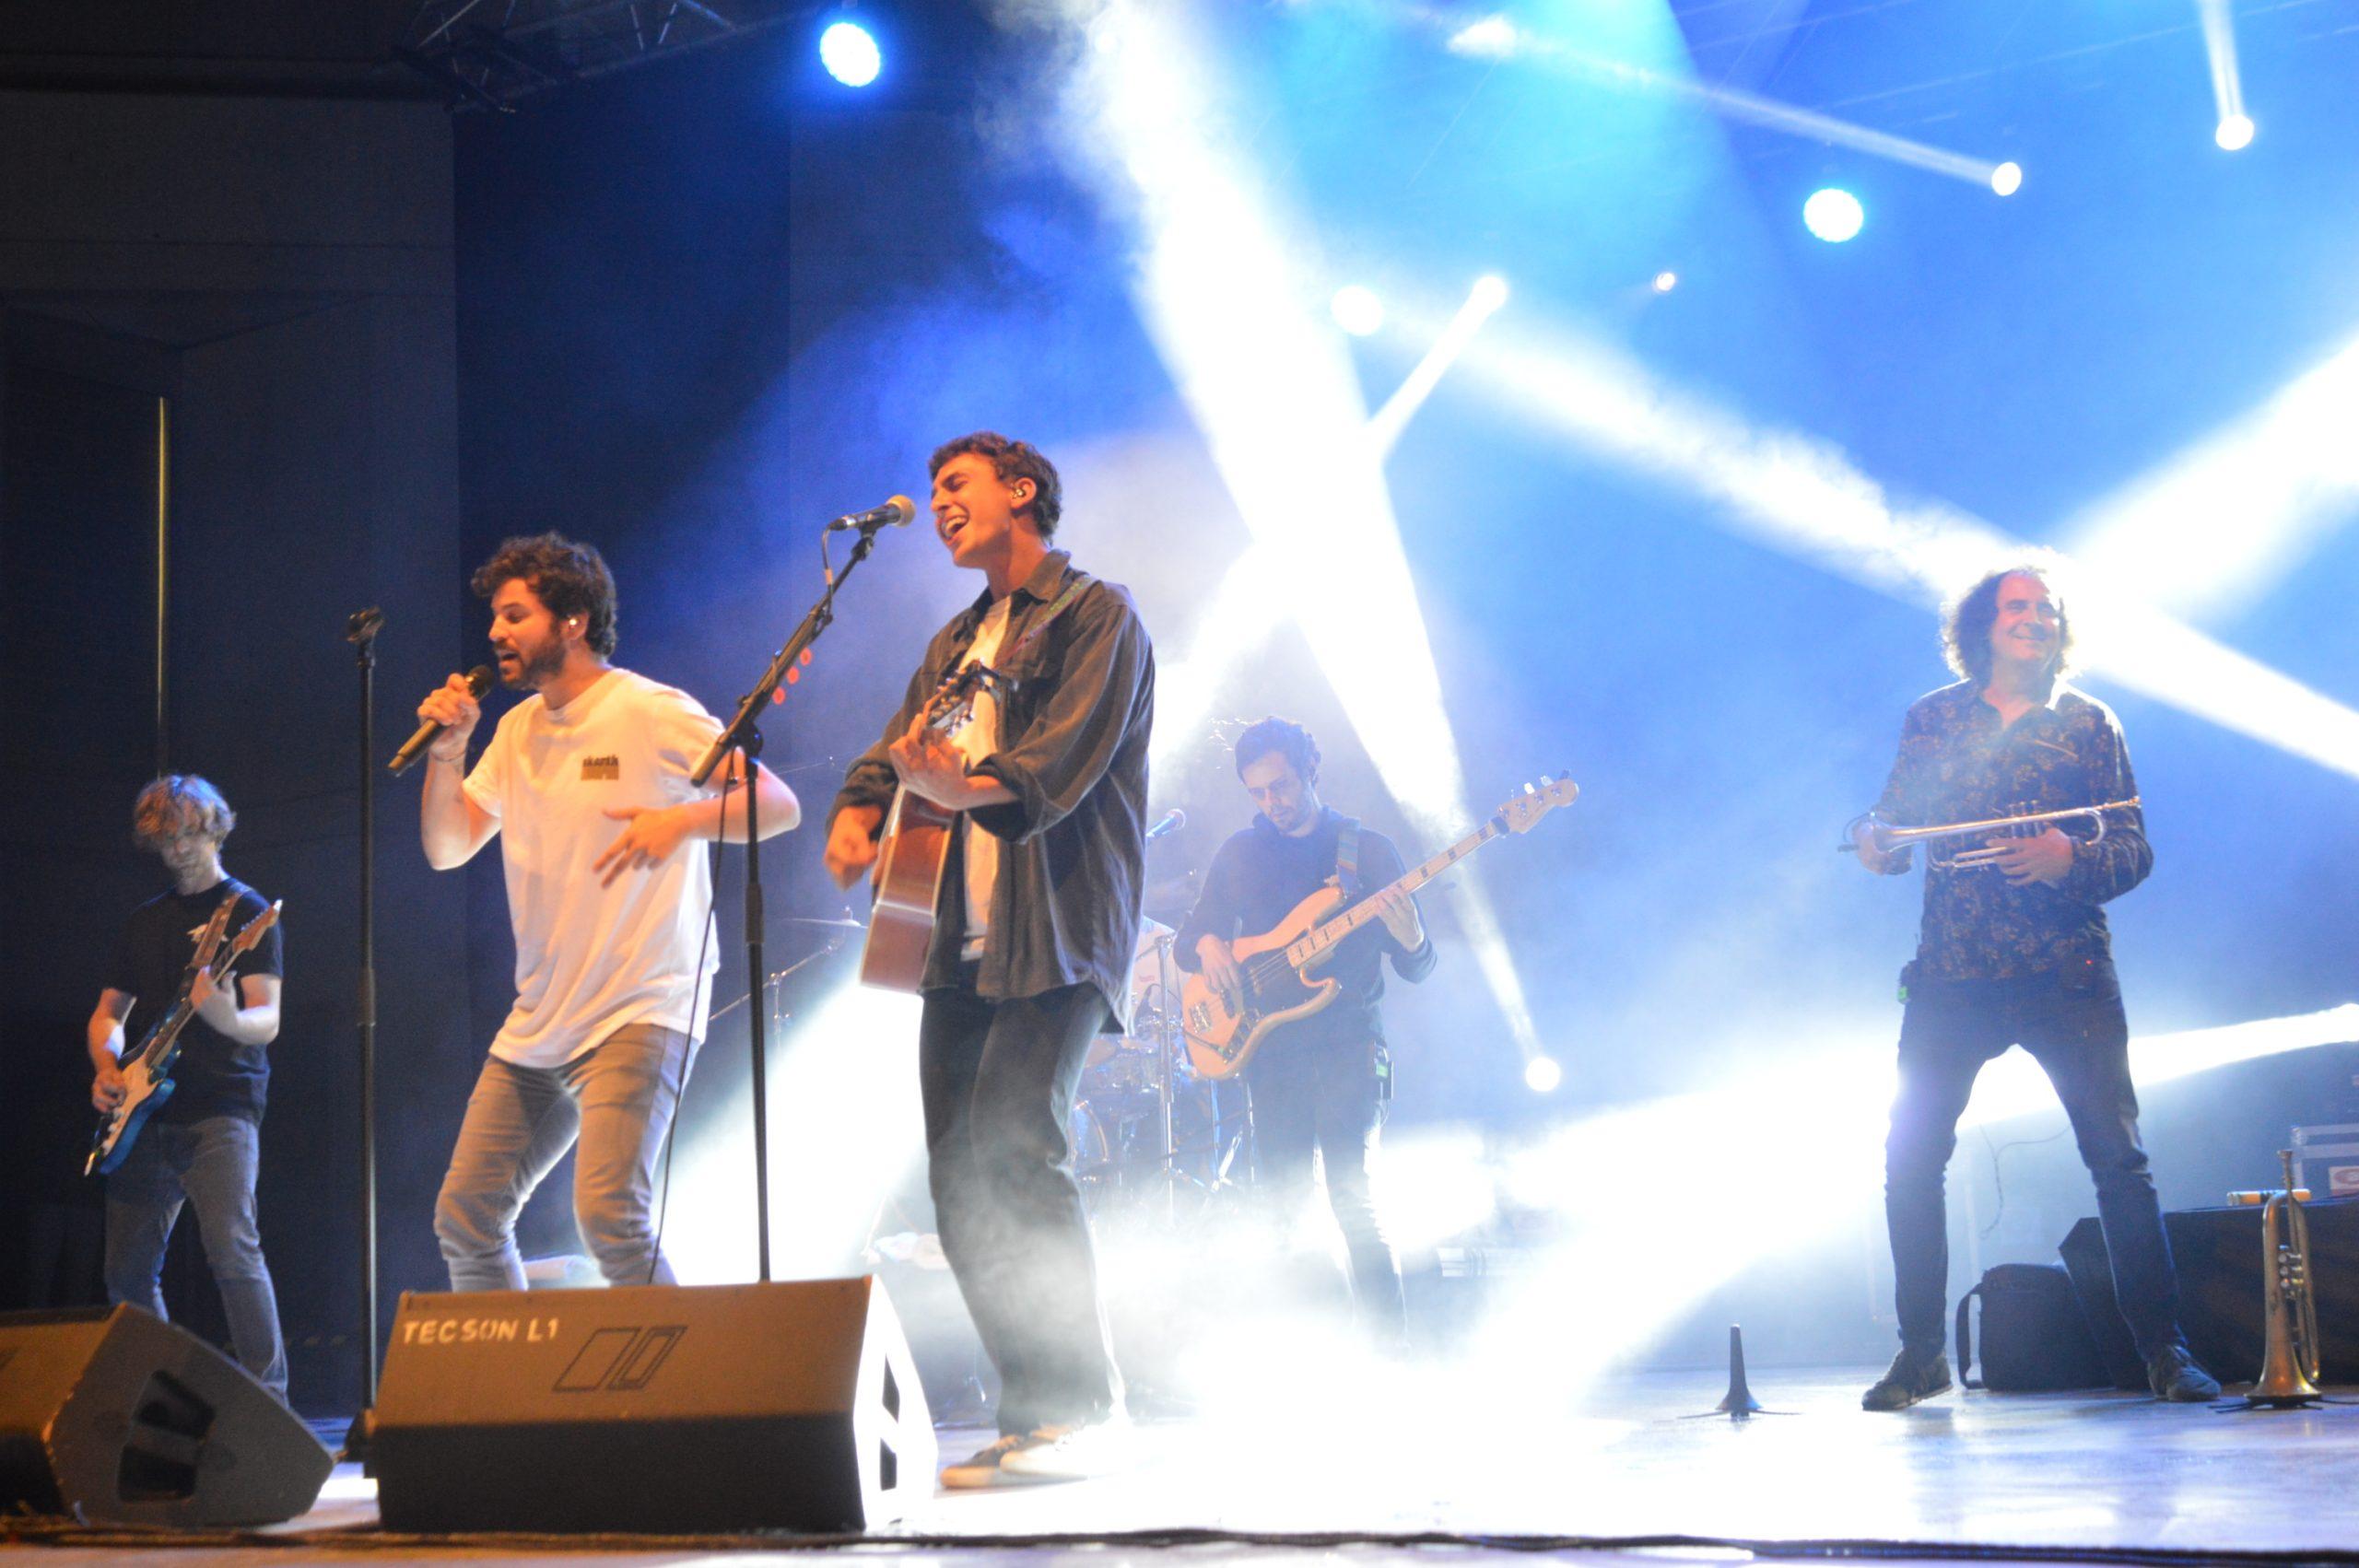 Taburete se entrega a su público en Ponferrada y dan la alternativa al ponferradino Pravlenha 13